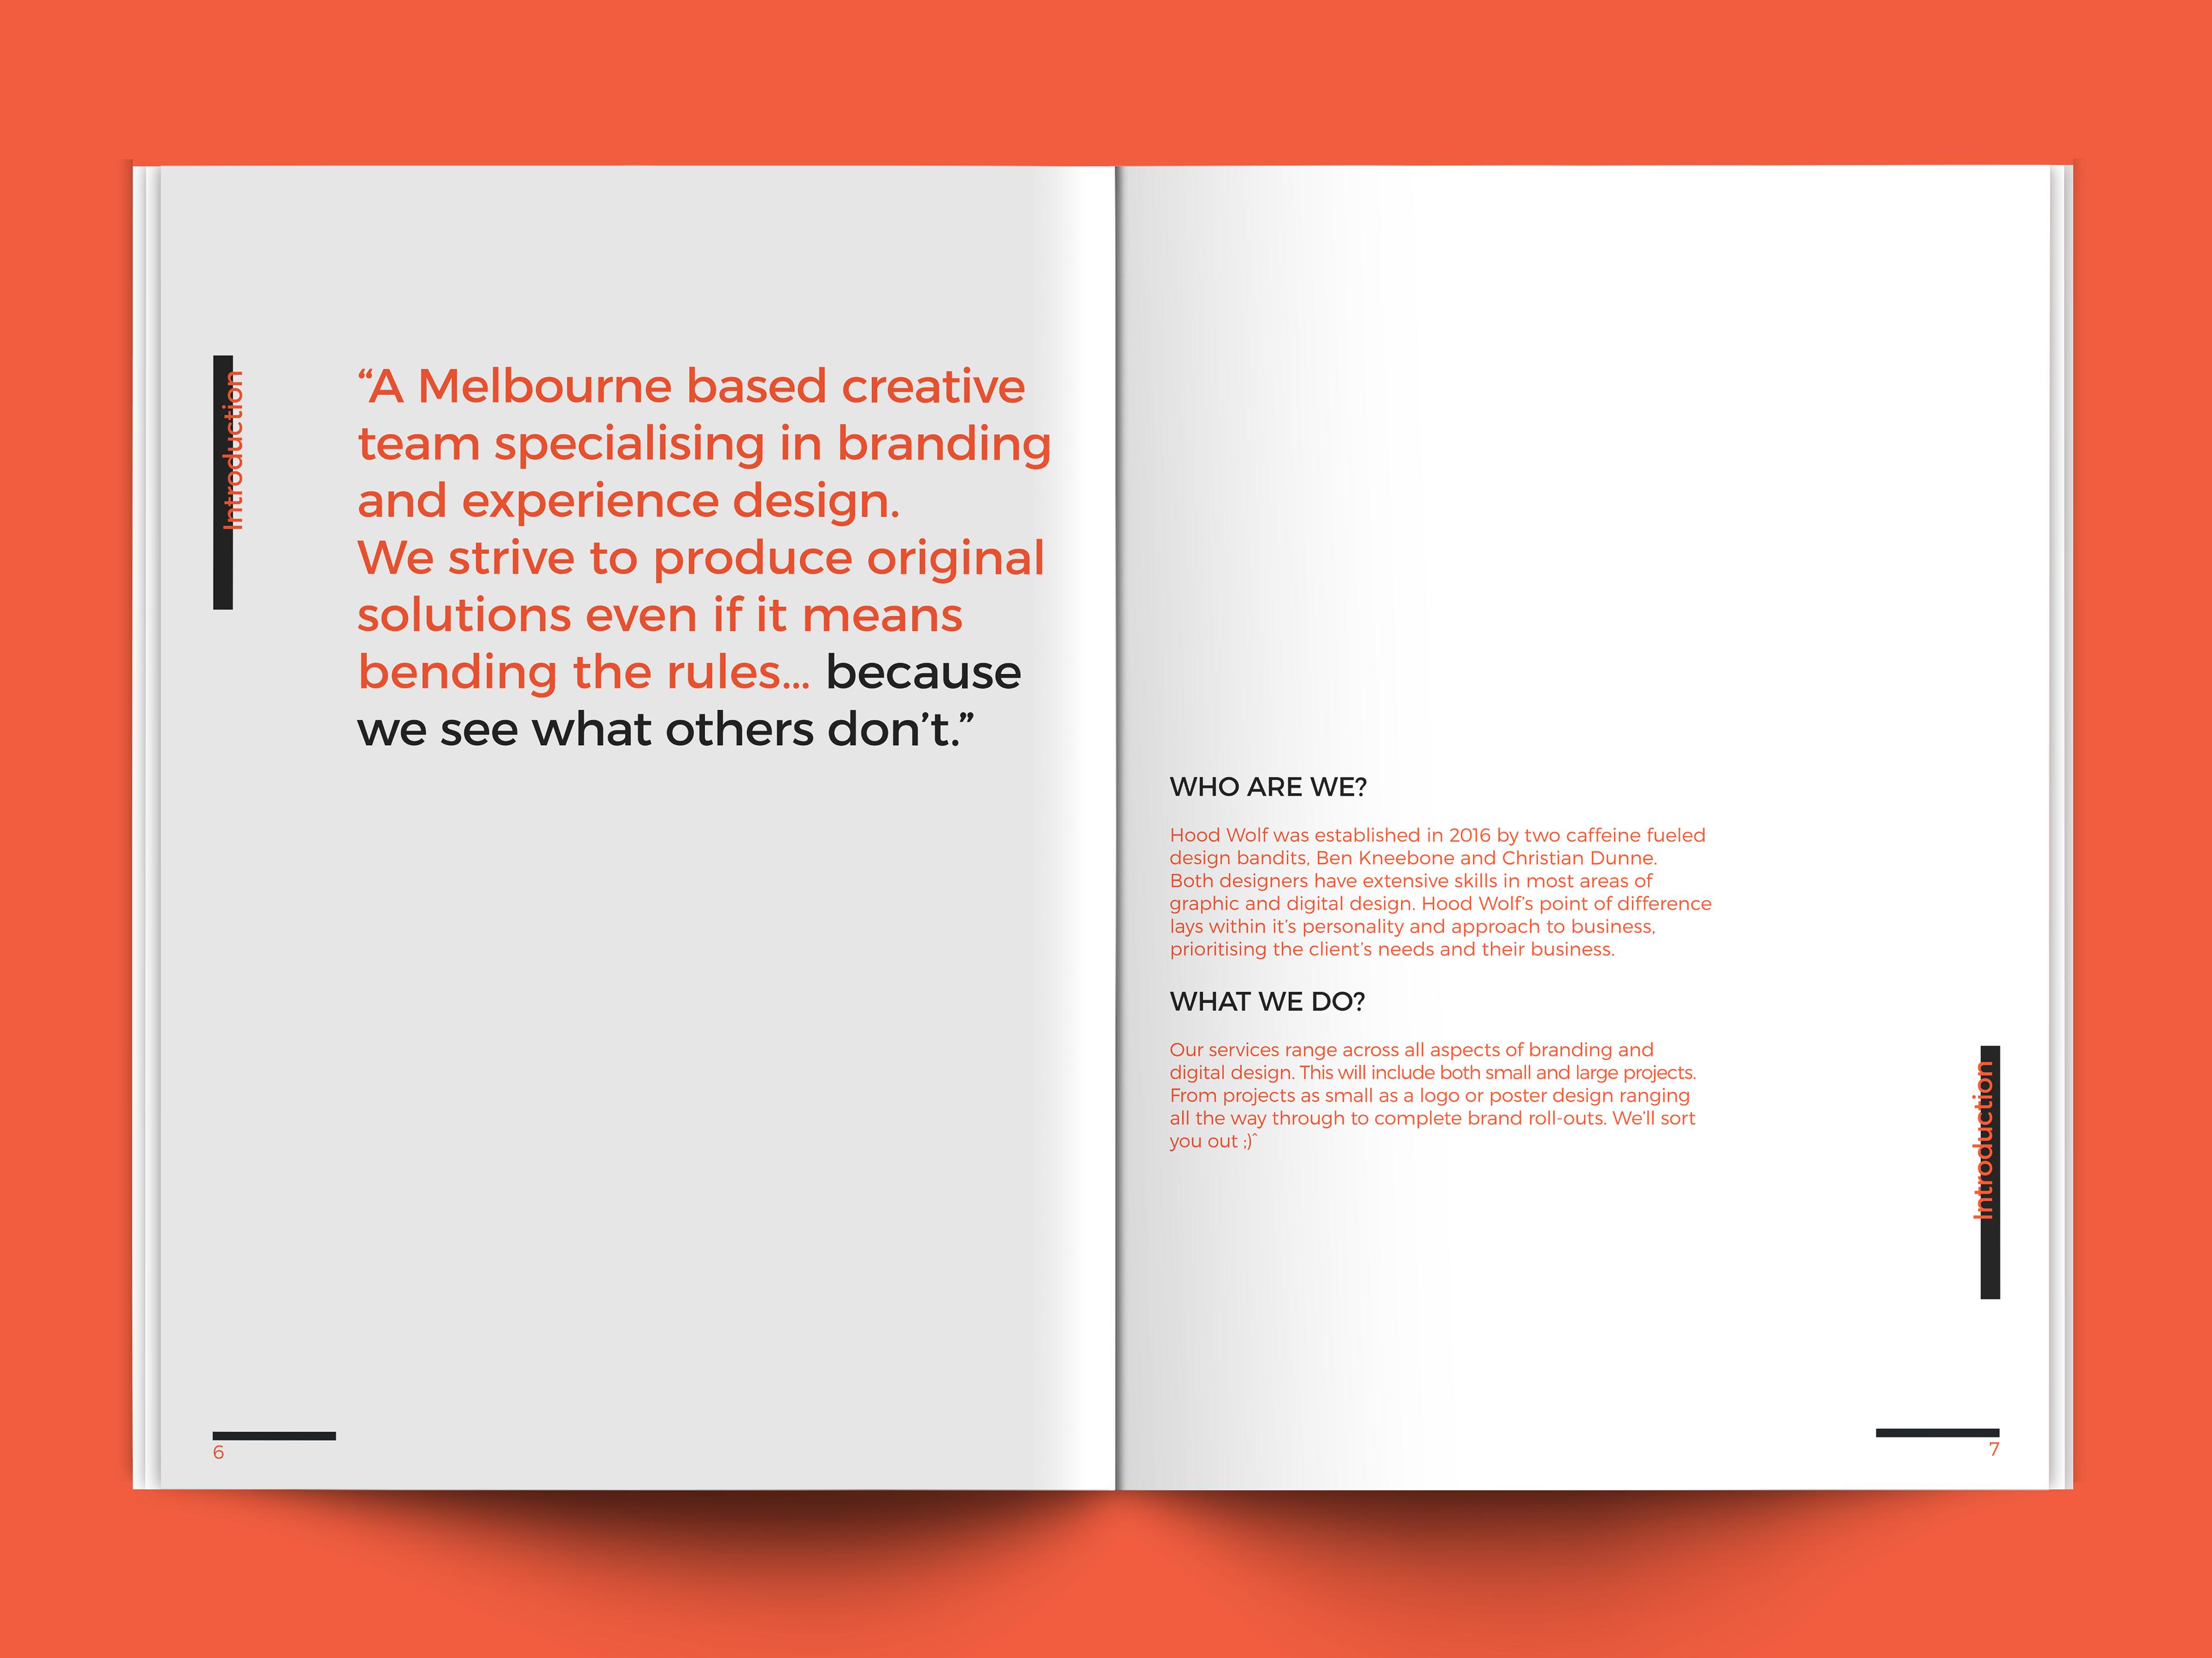 Christian Dunne - Hood Wolf Brand Guidelines